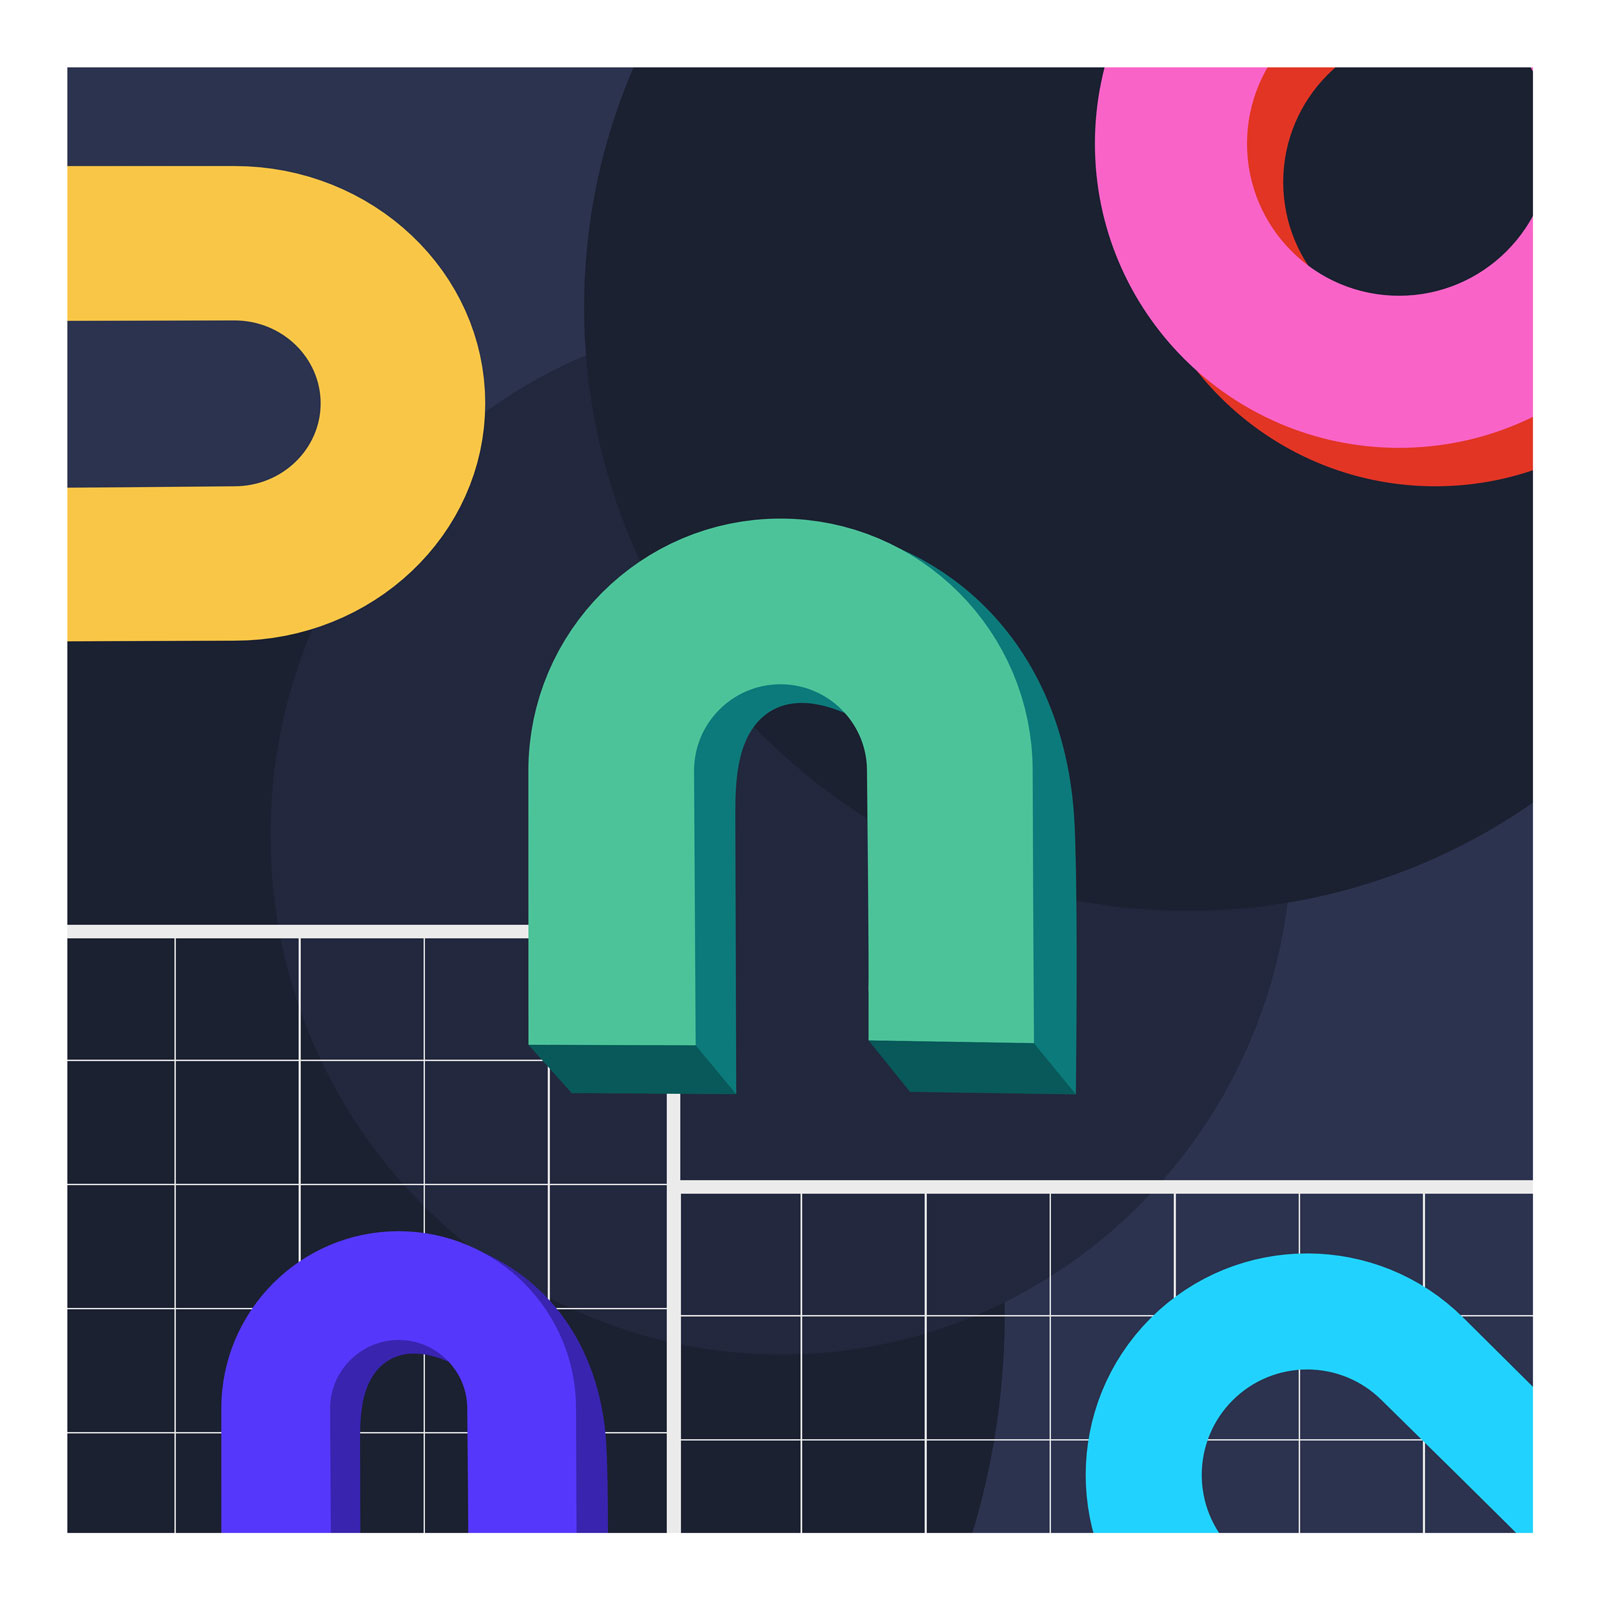 Arc-n-grid-s